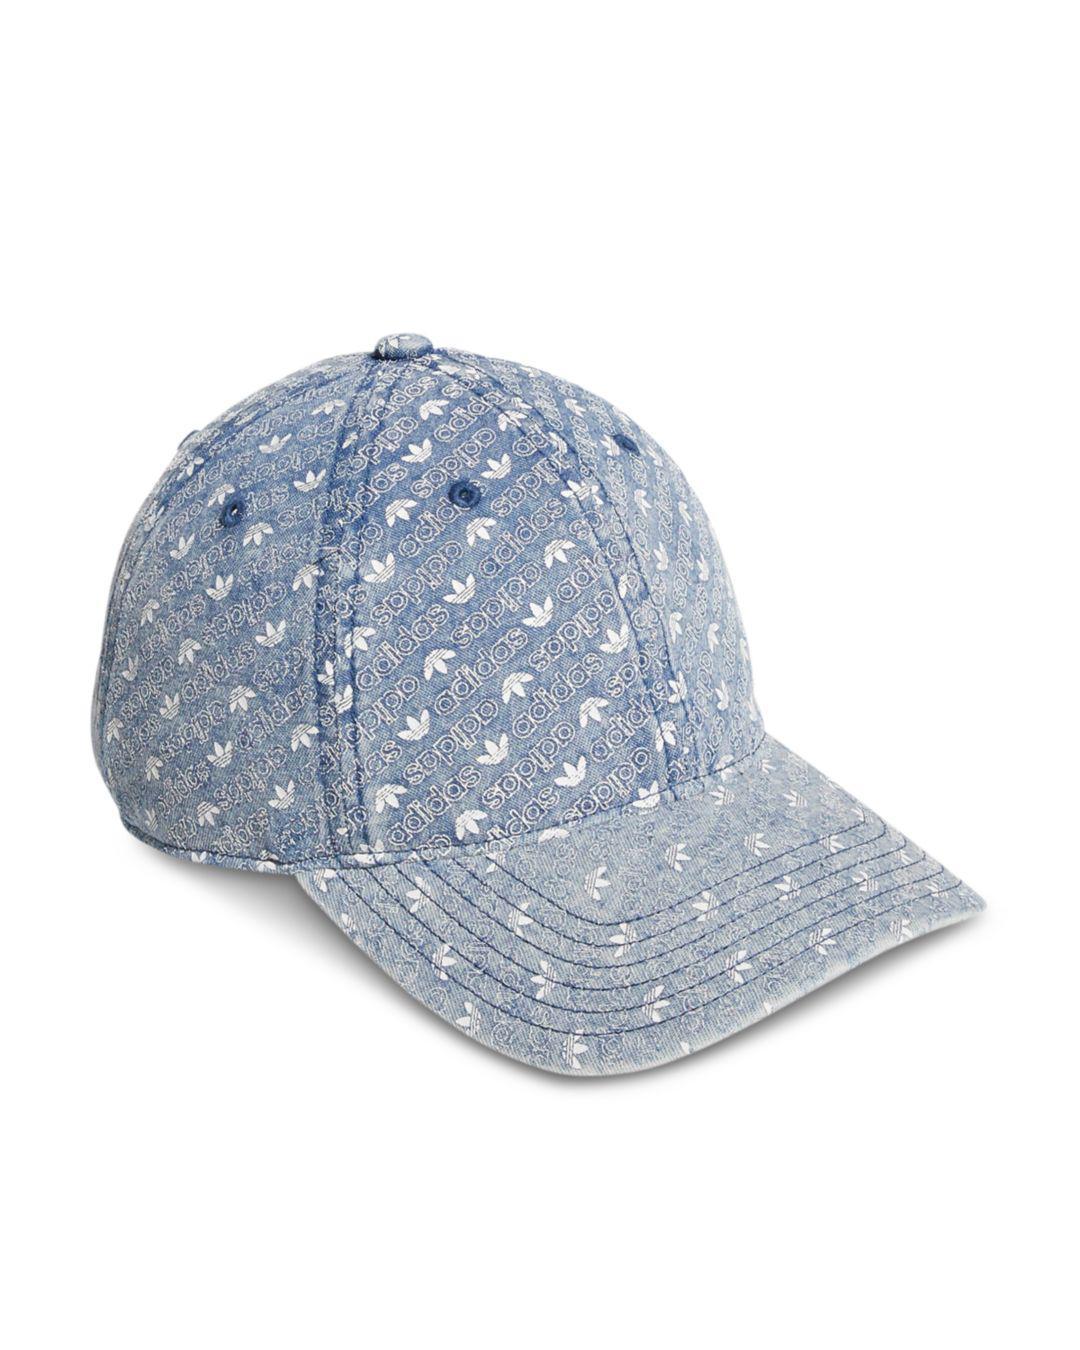 Lyst - adidas Originals Denim Monogram Snapback Hat in Blue for Men b35cdf943848